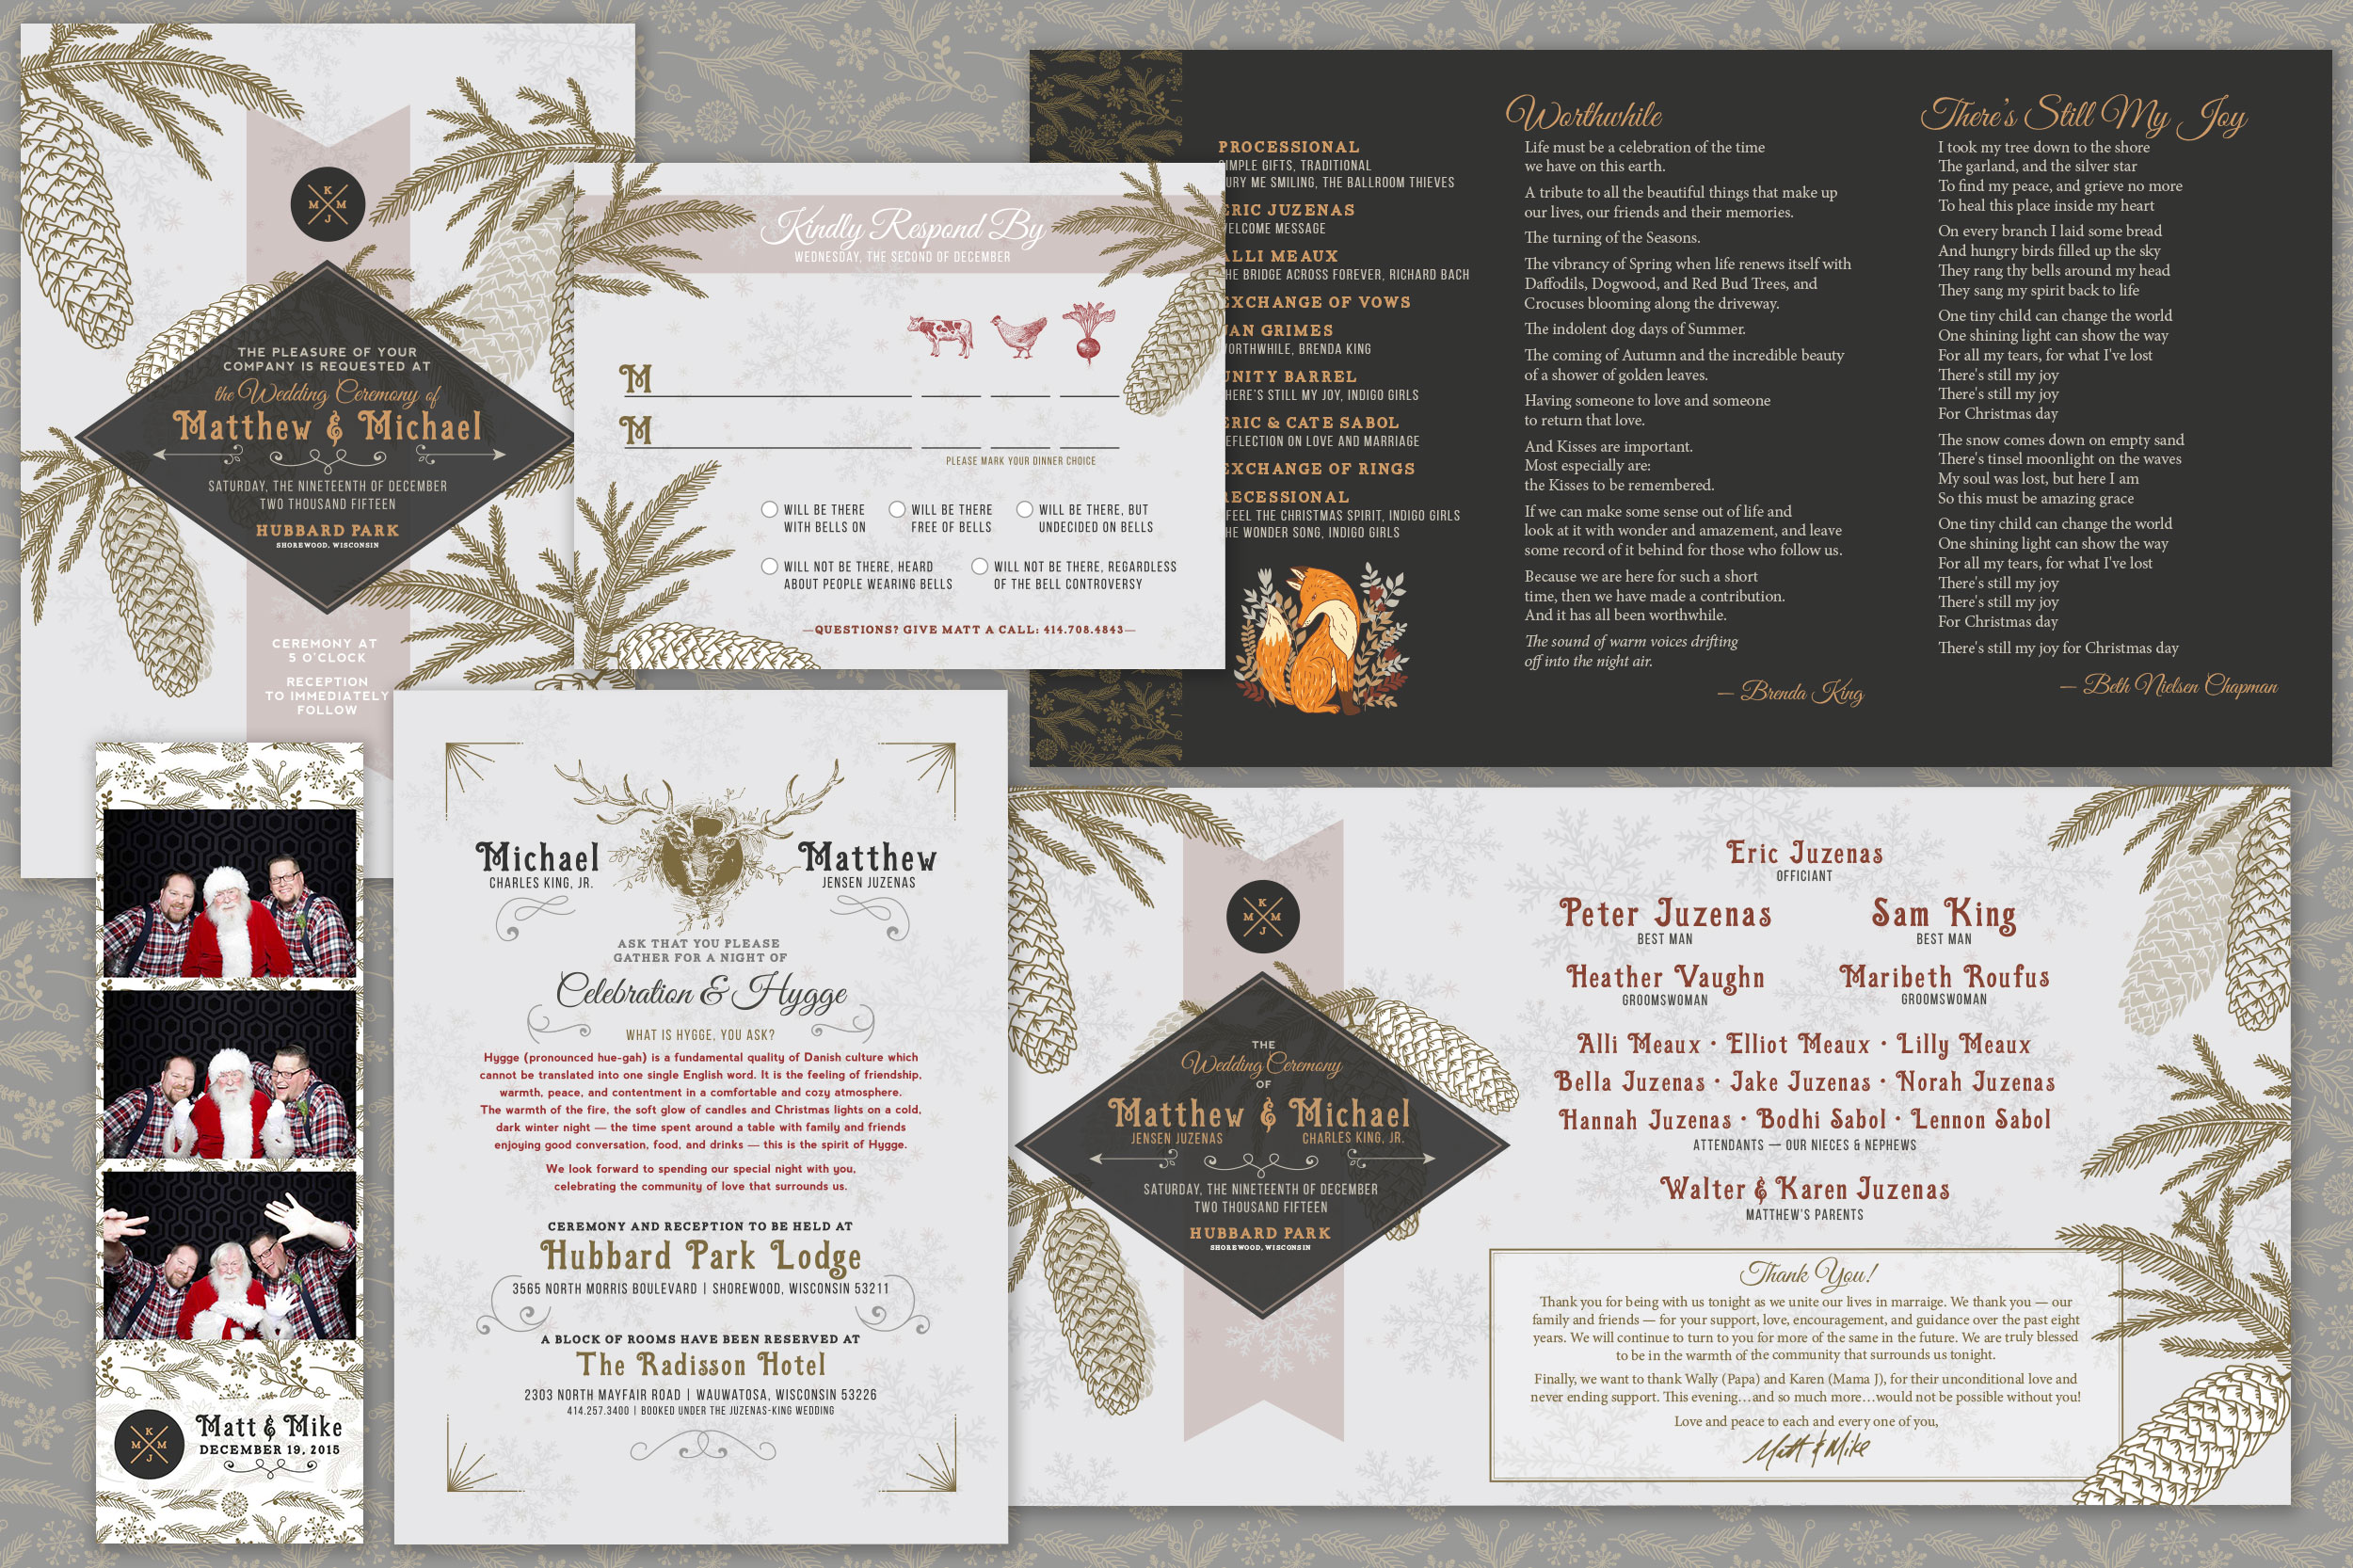 Wedding Invitation and Program (2015)